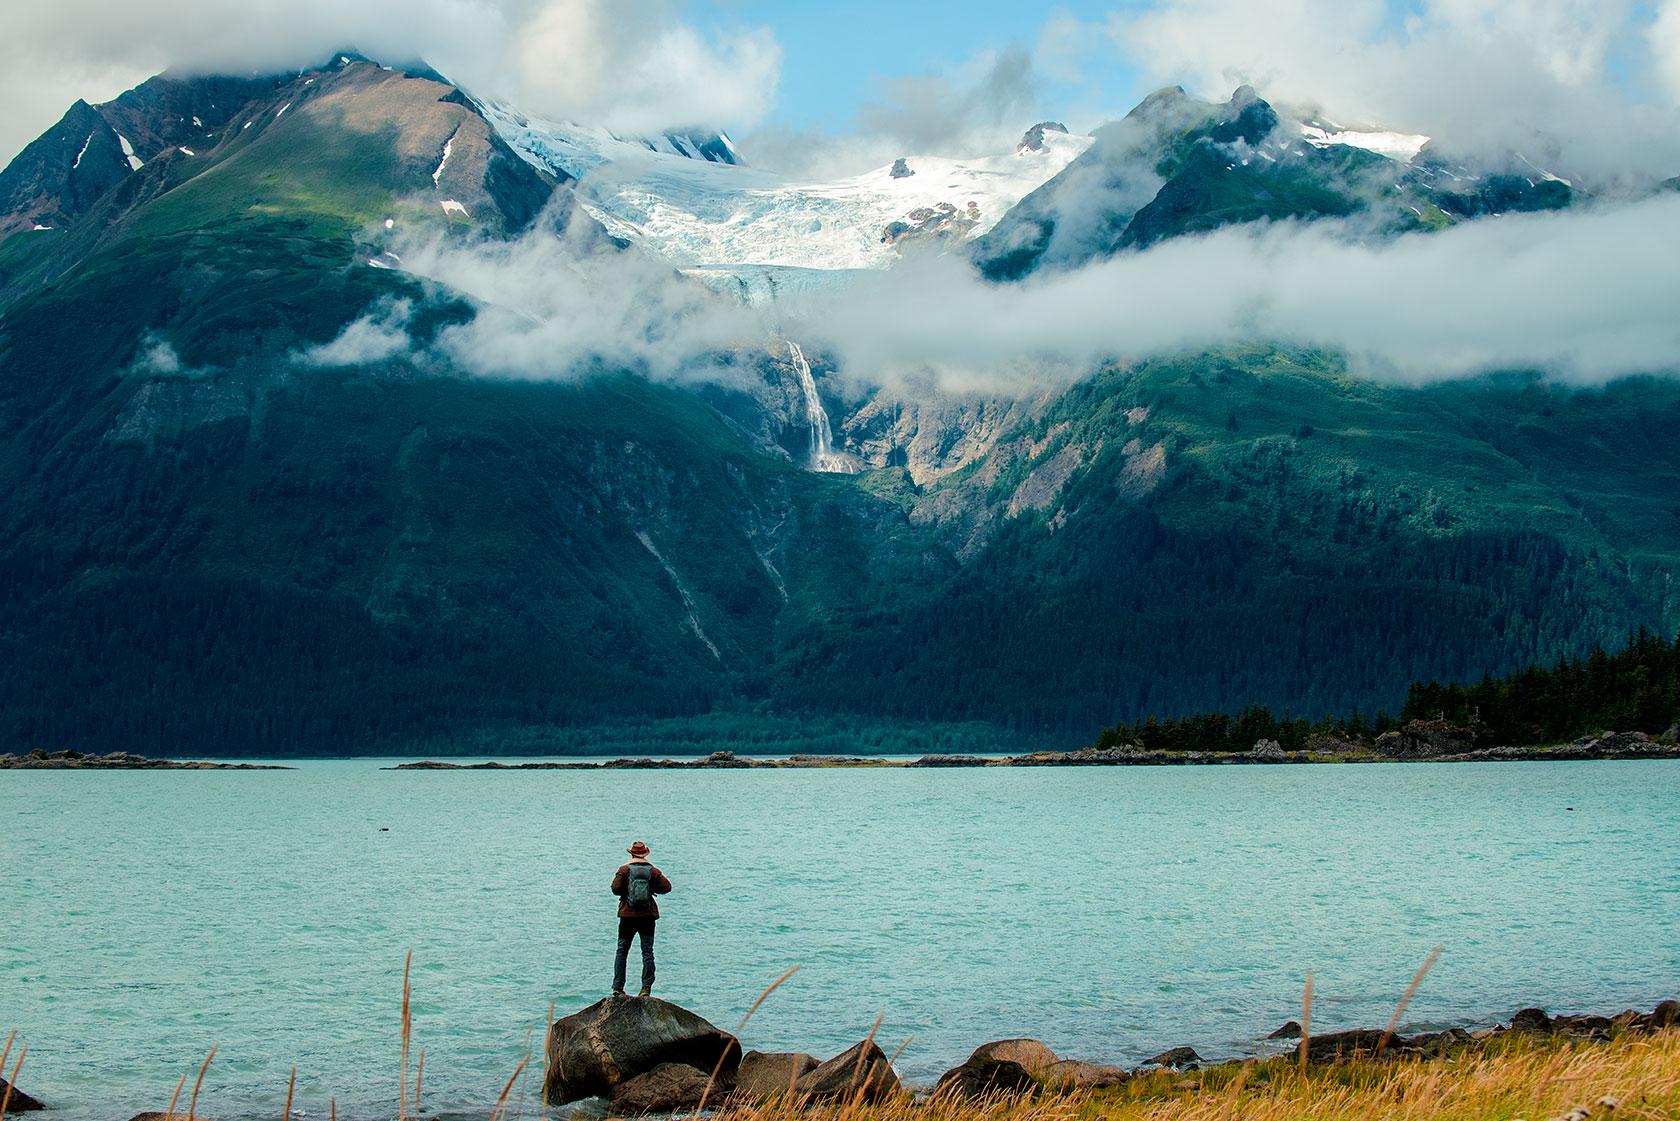 austin-trigg-brave-wilderness-alaska-BW-Coyote-Stares-at-Rainbow-Glacier.jpg